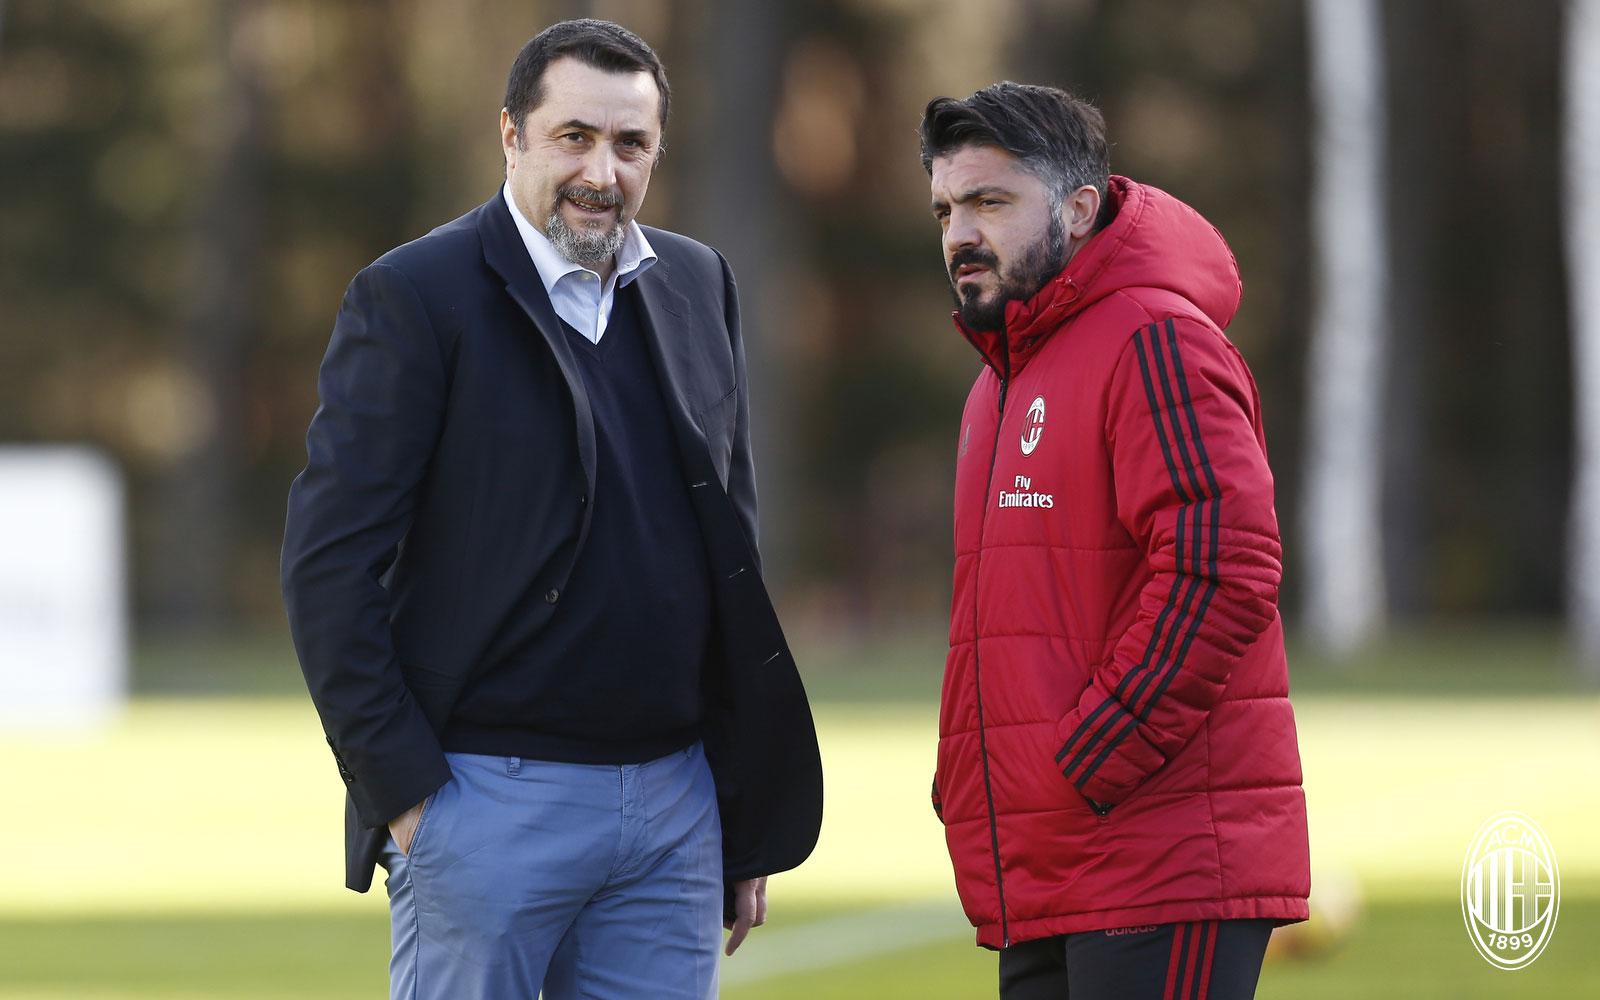 Massimiliano Mirabelli and Gennaro Gattuso at training center Milanello on January 4, 2018. (@acmilan.com)